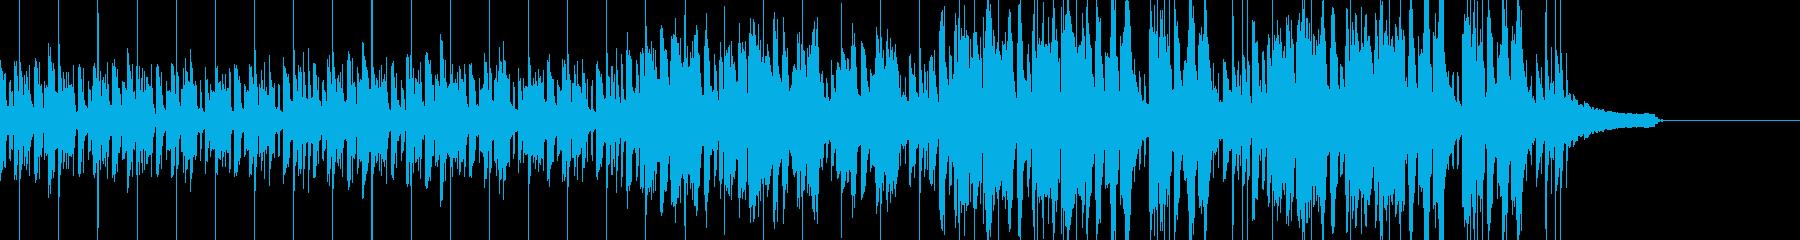 Future bass風の曲の再生済みの波形